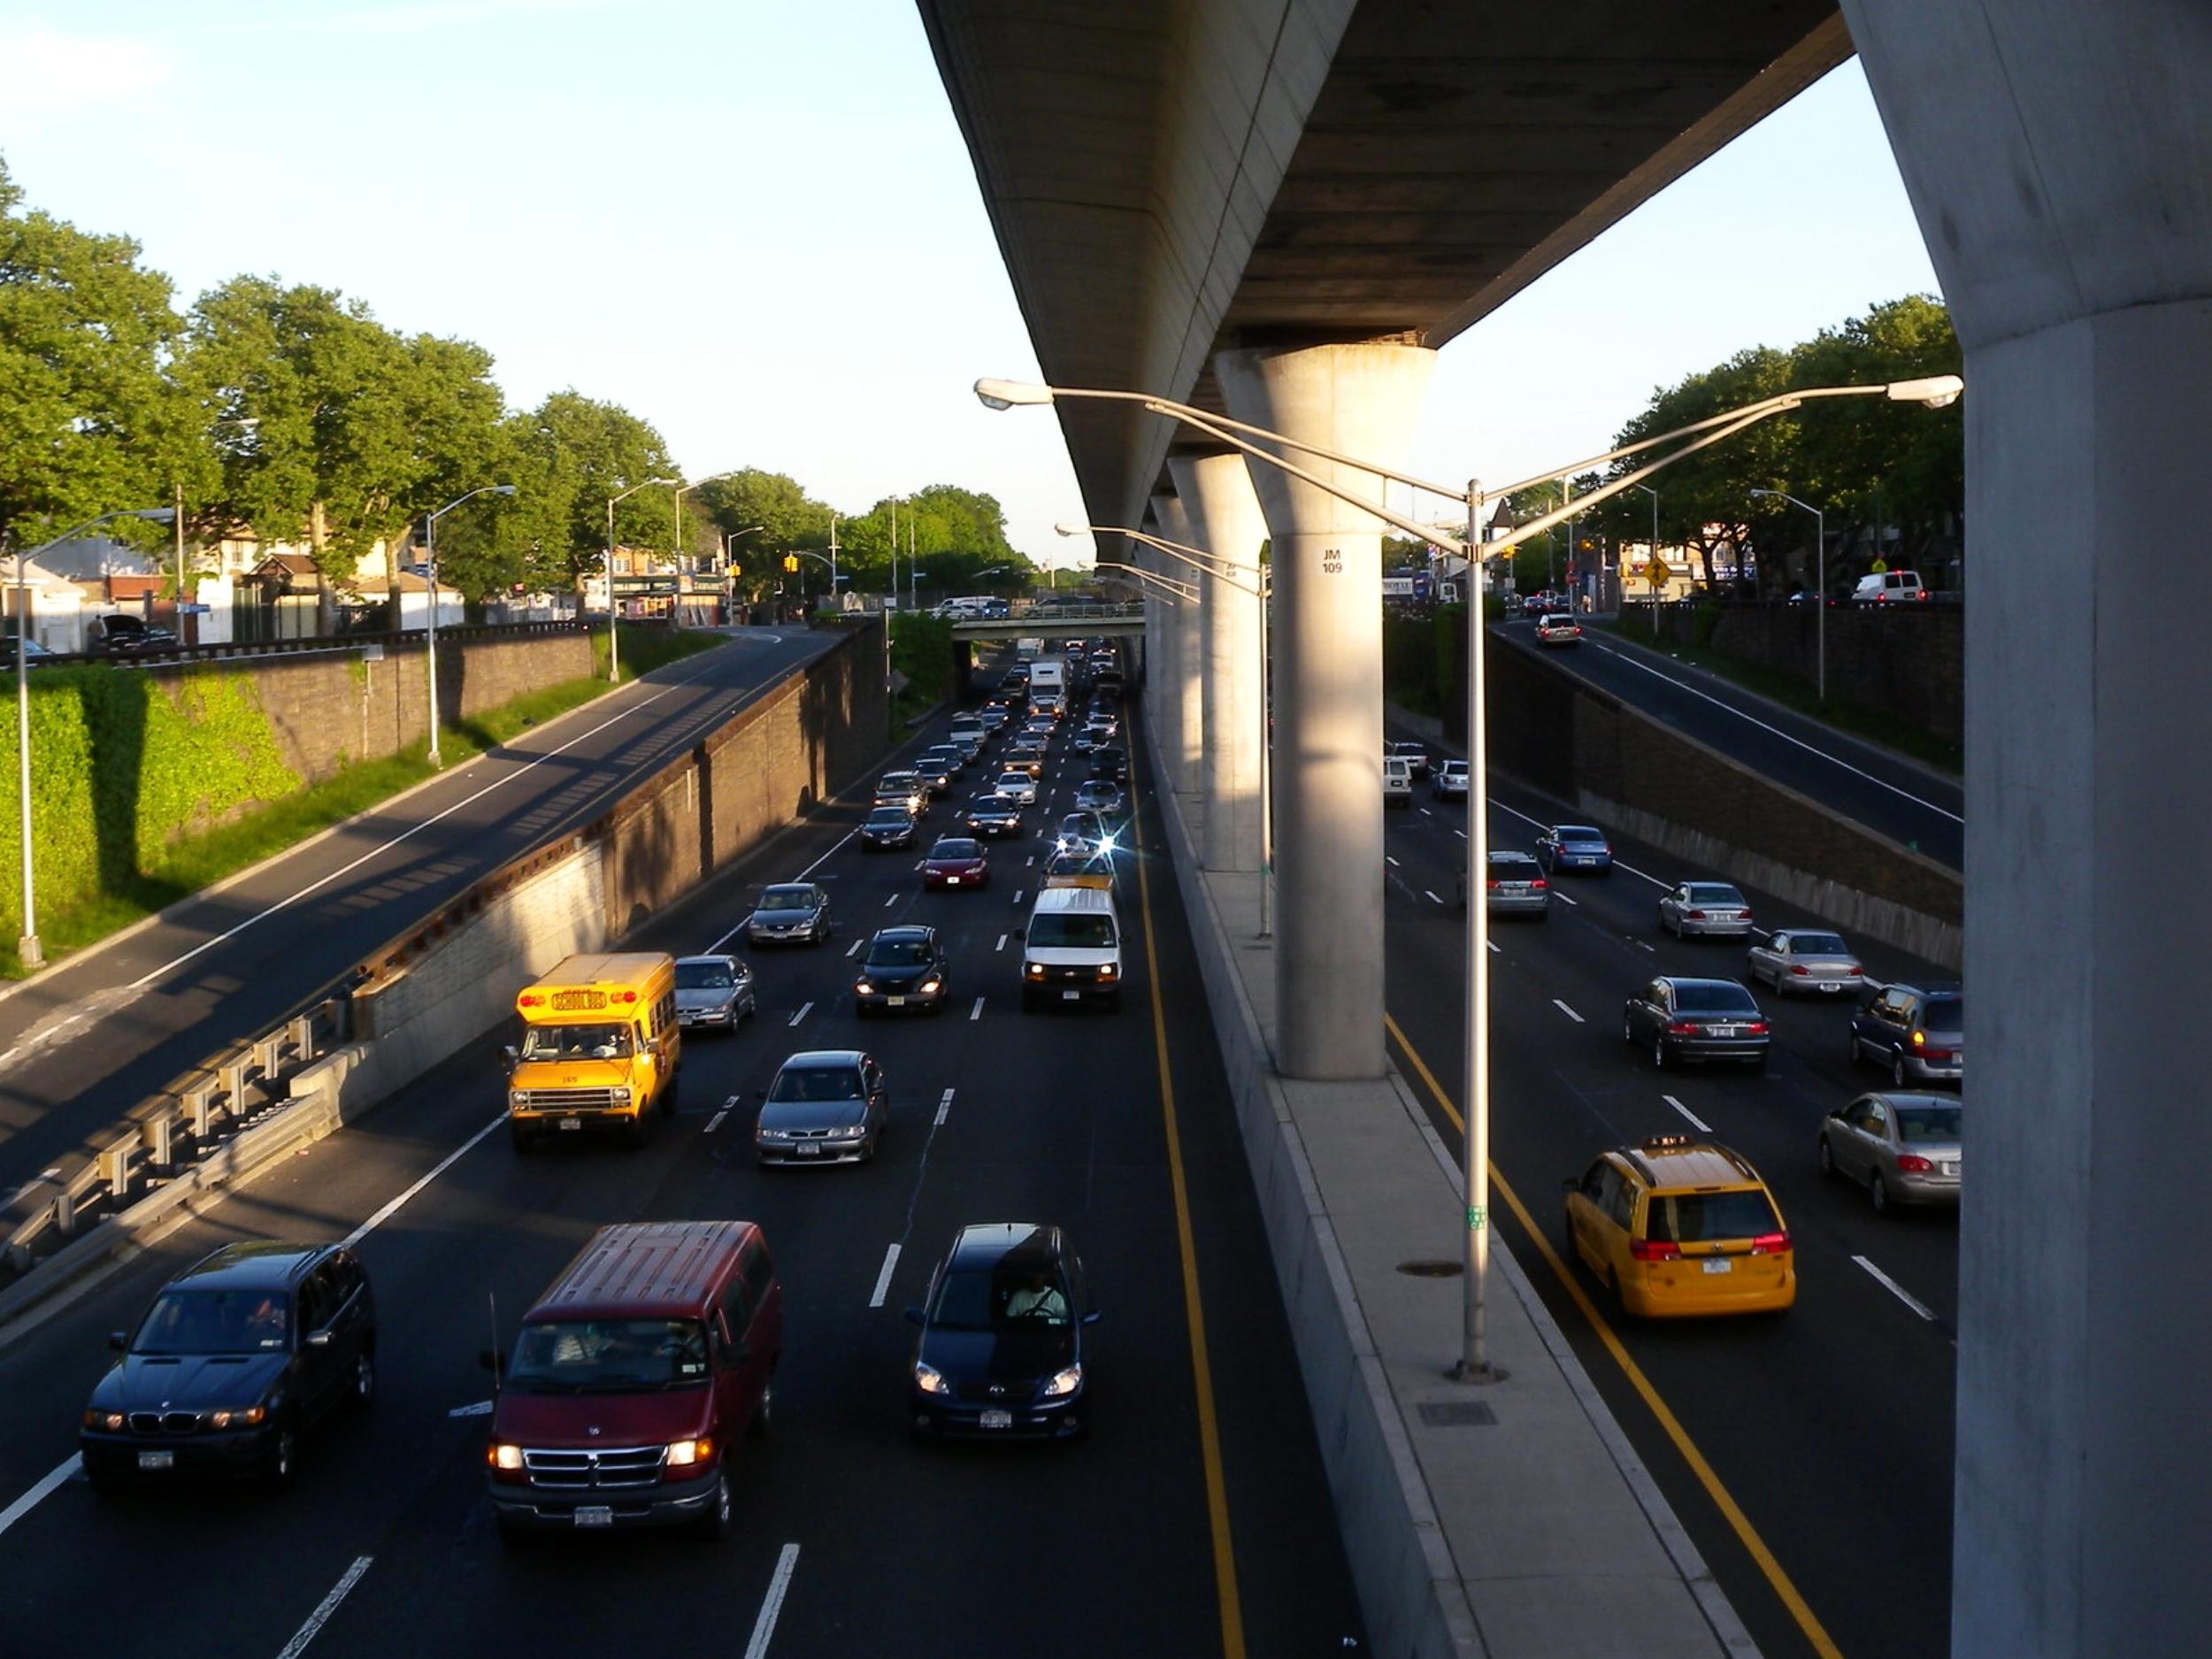 JFK Traffic Image2.jpg